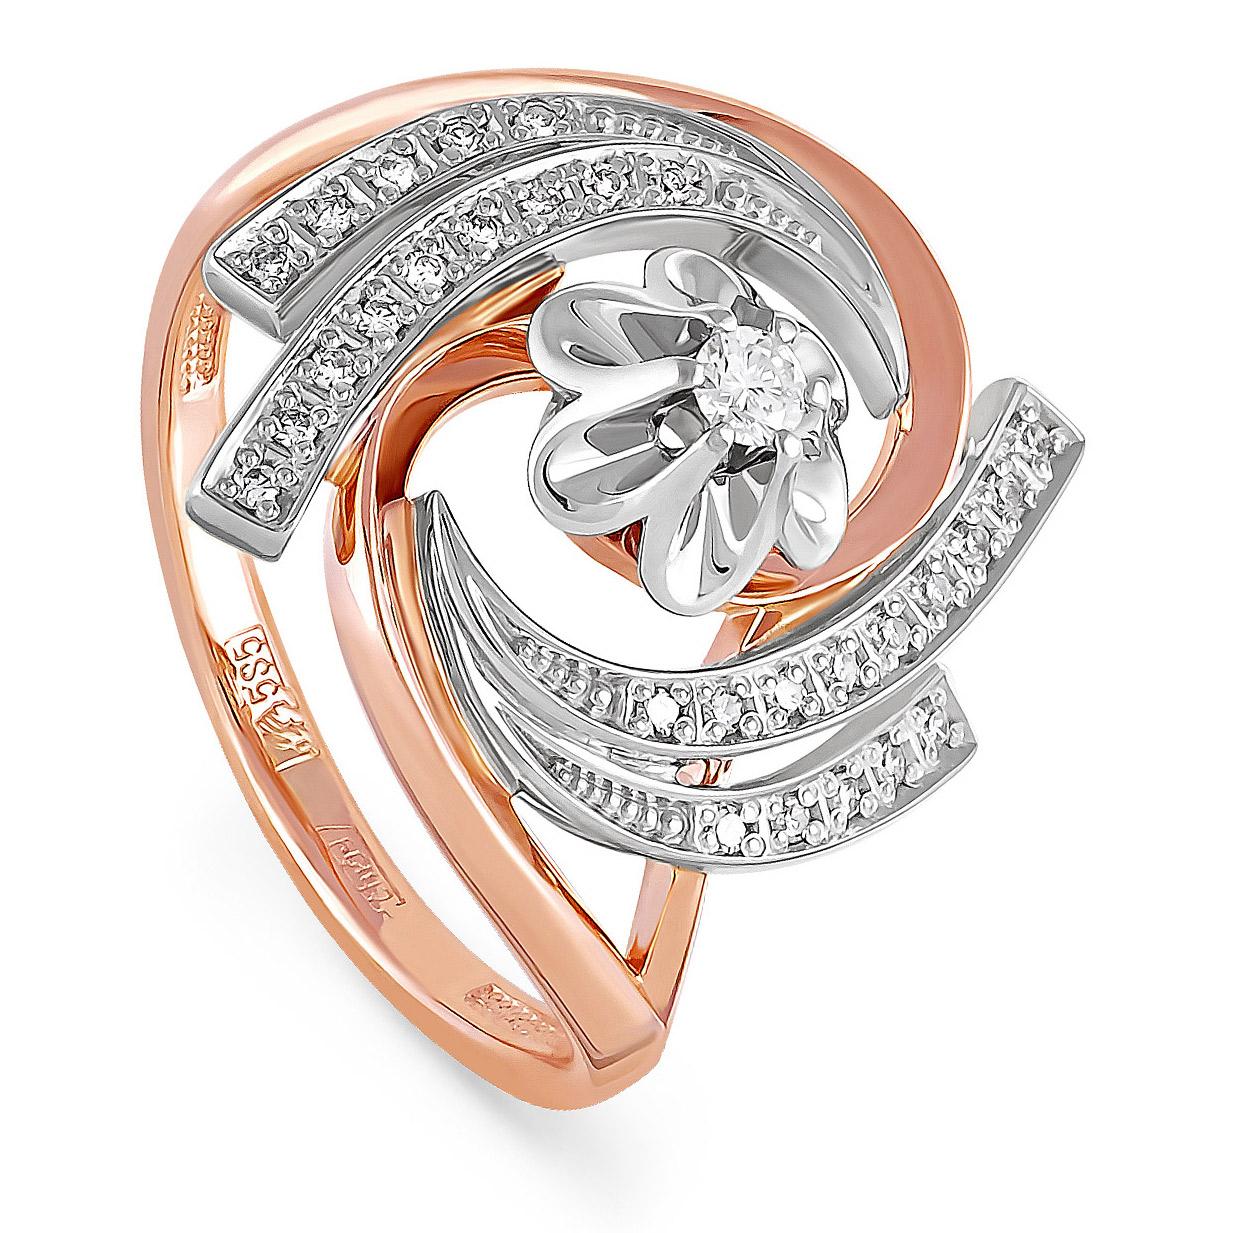 Золотое кольцо Бриллиант арт. 11-0369-1000 11-0369-1000